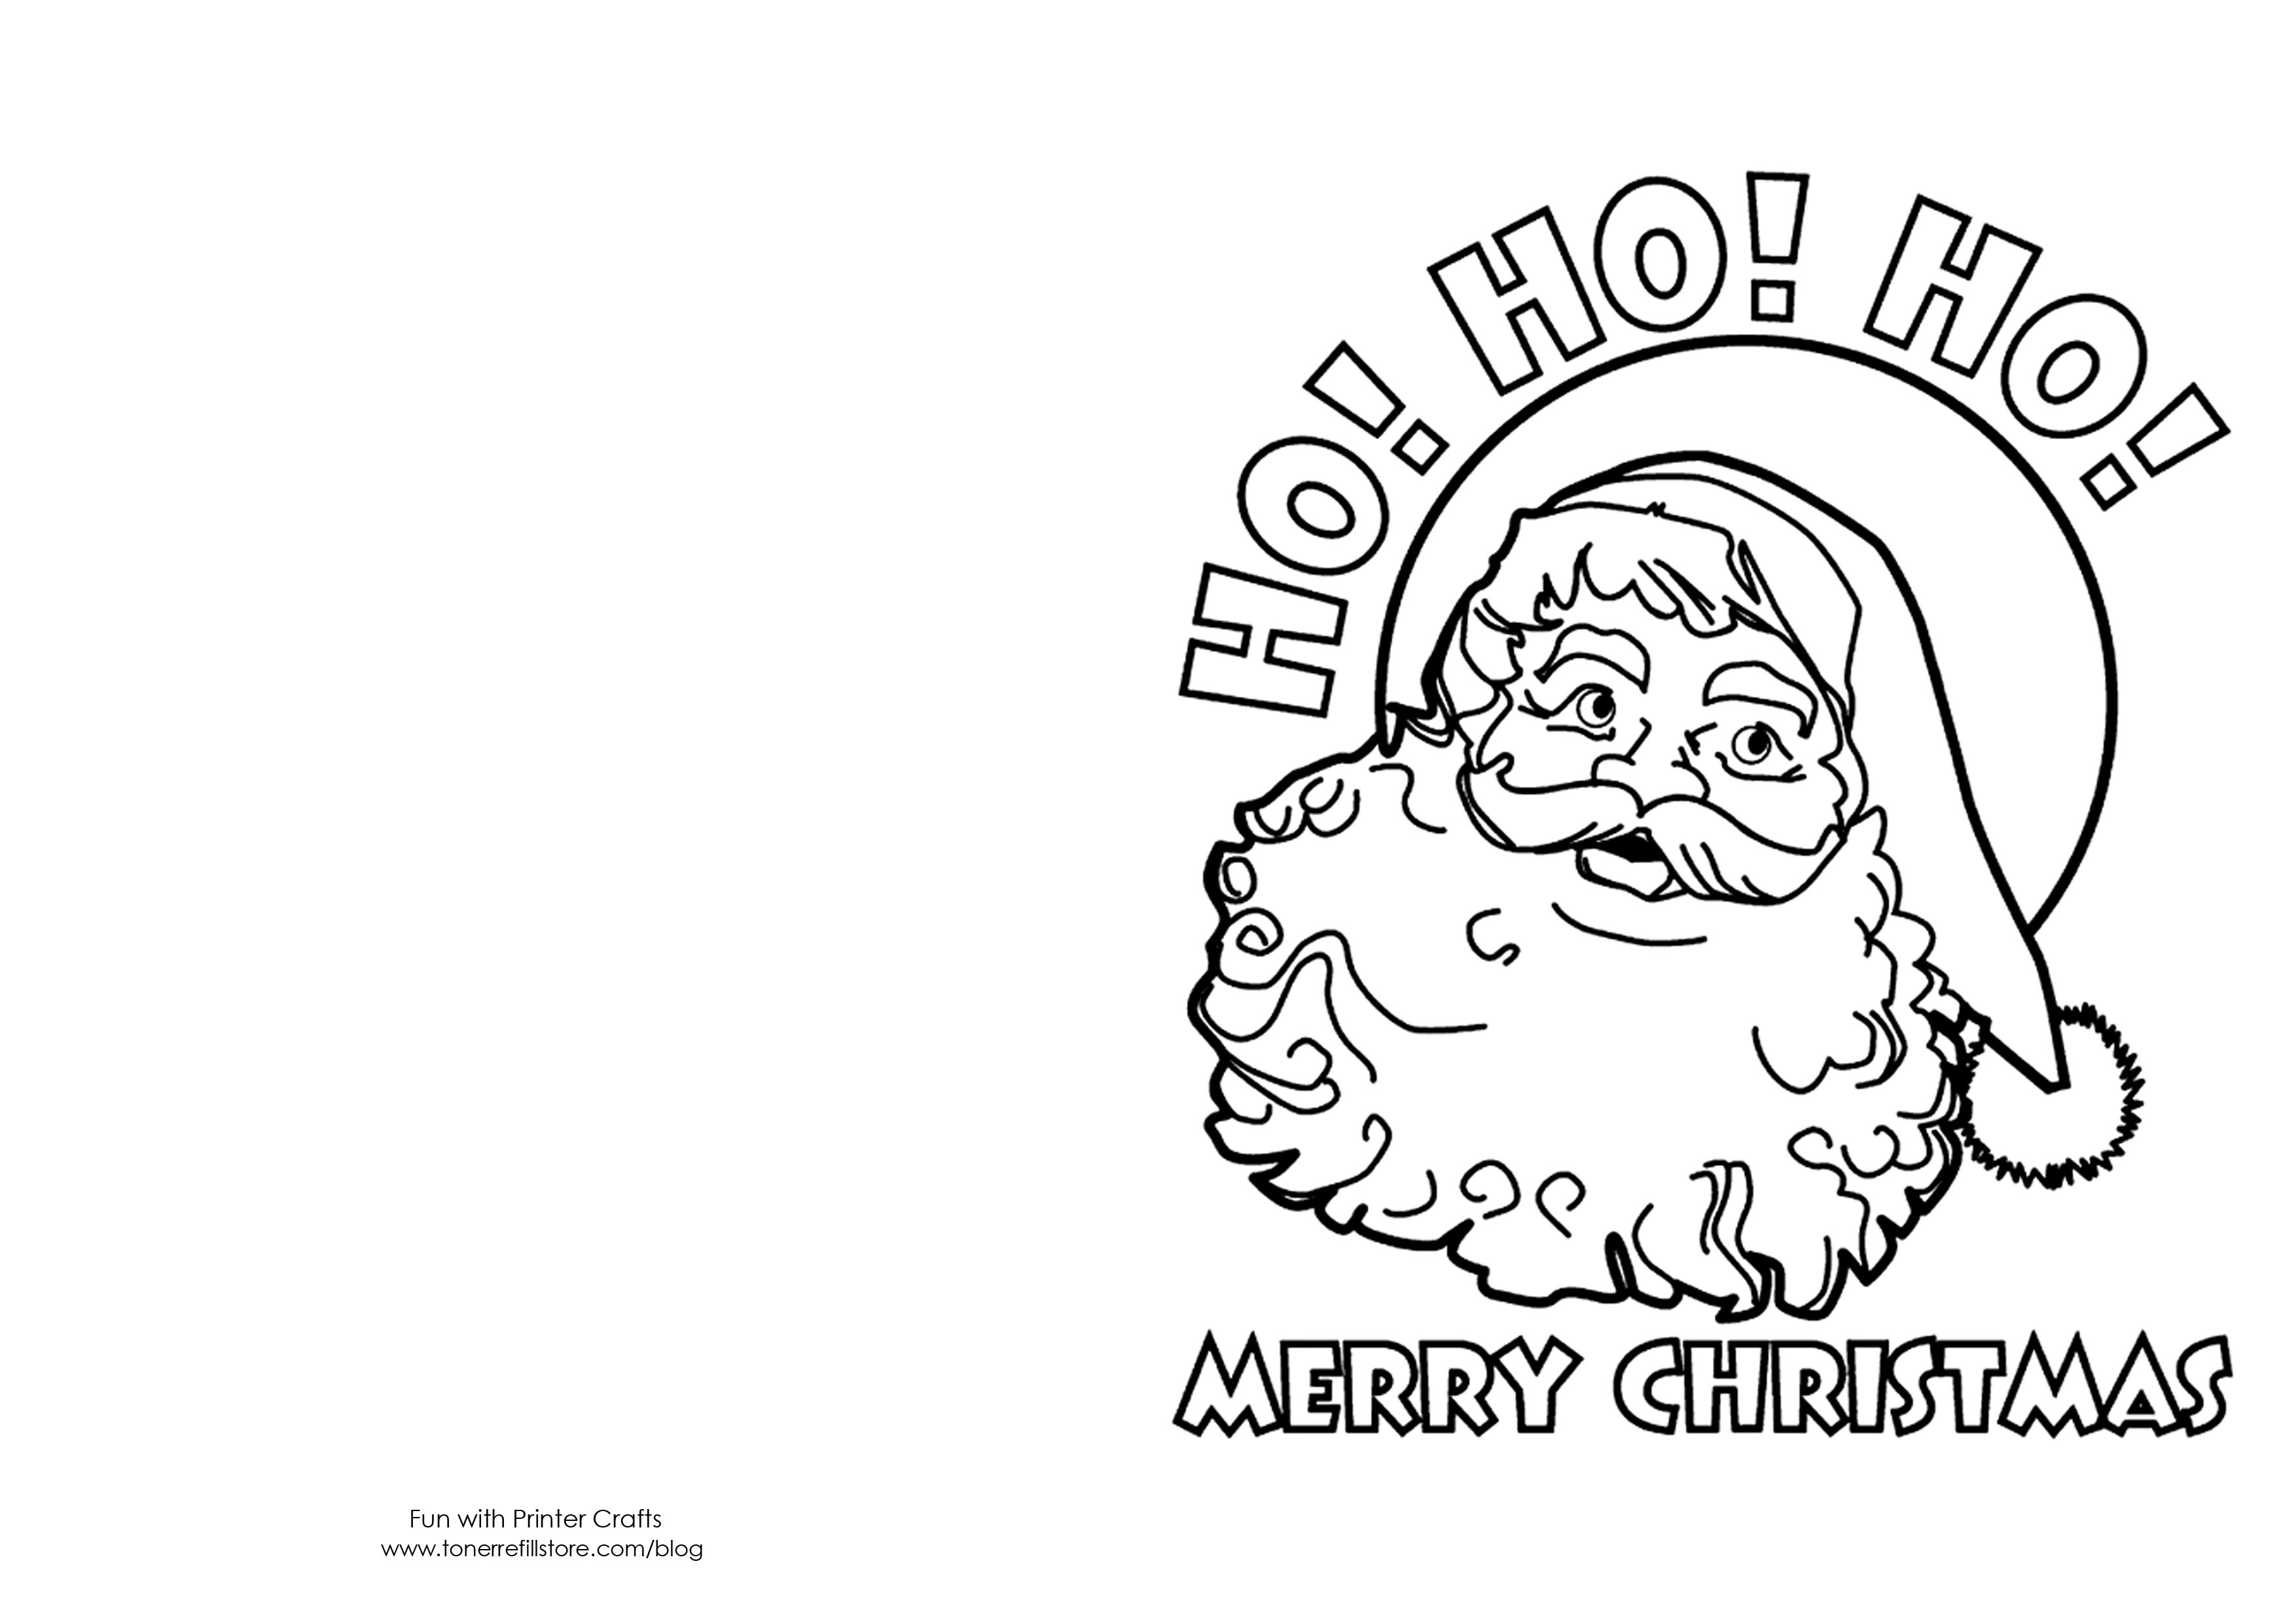 Printable Christmas Coloring Cards Kids Free Printable Christmas Cards Printable Christmas Cards Christmas Cards Kids